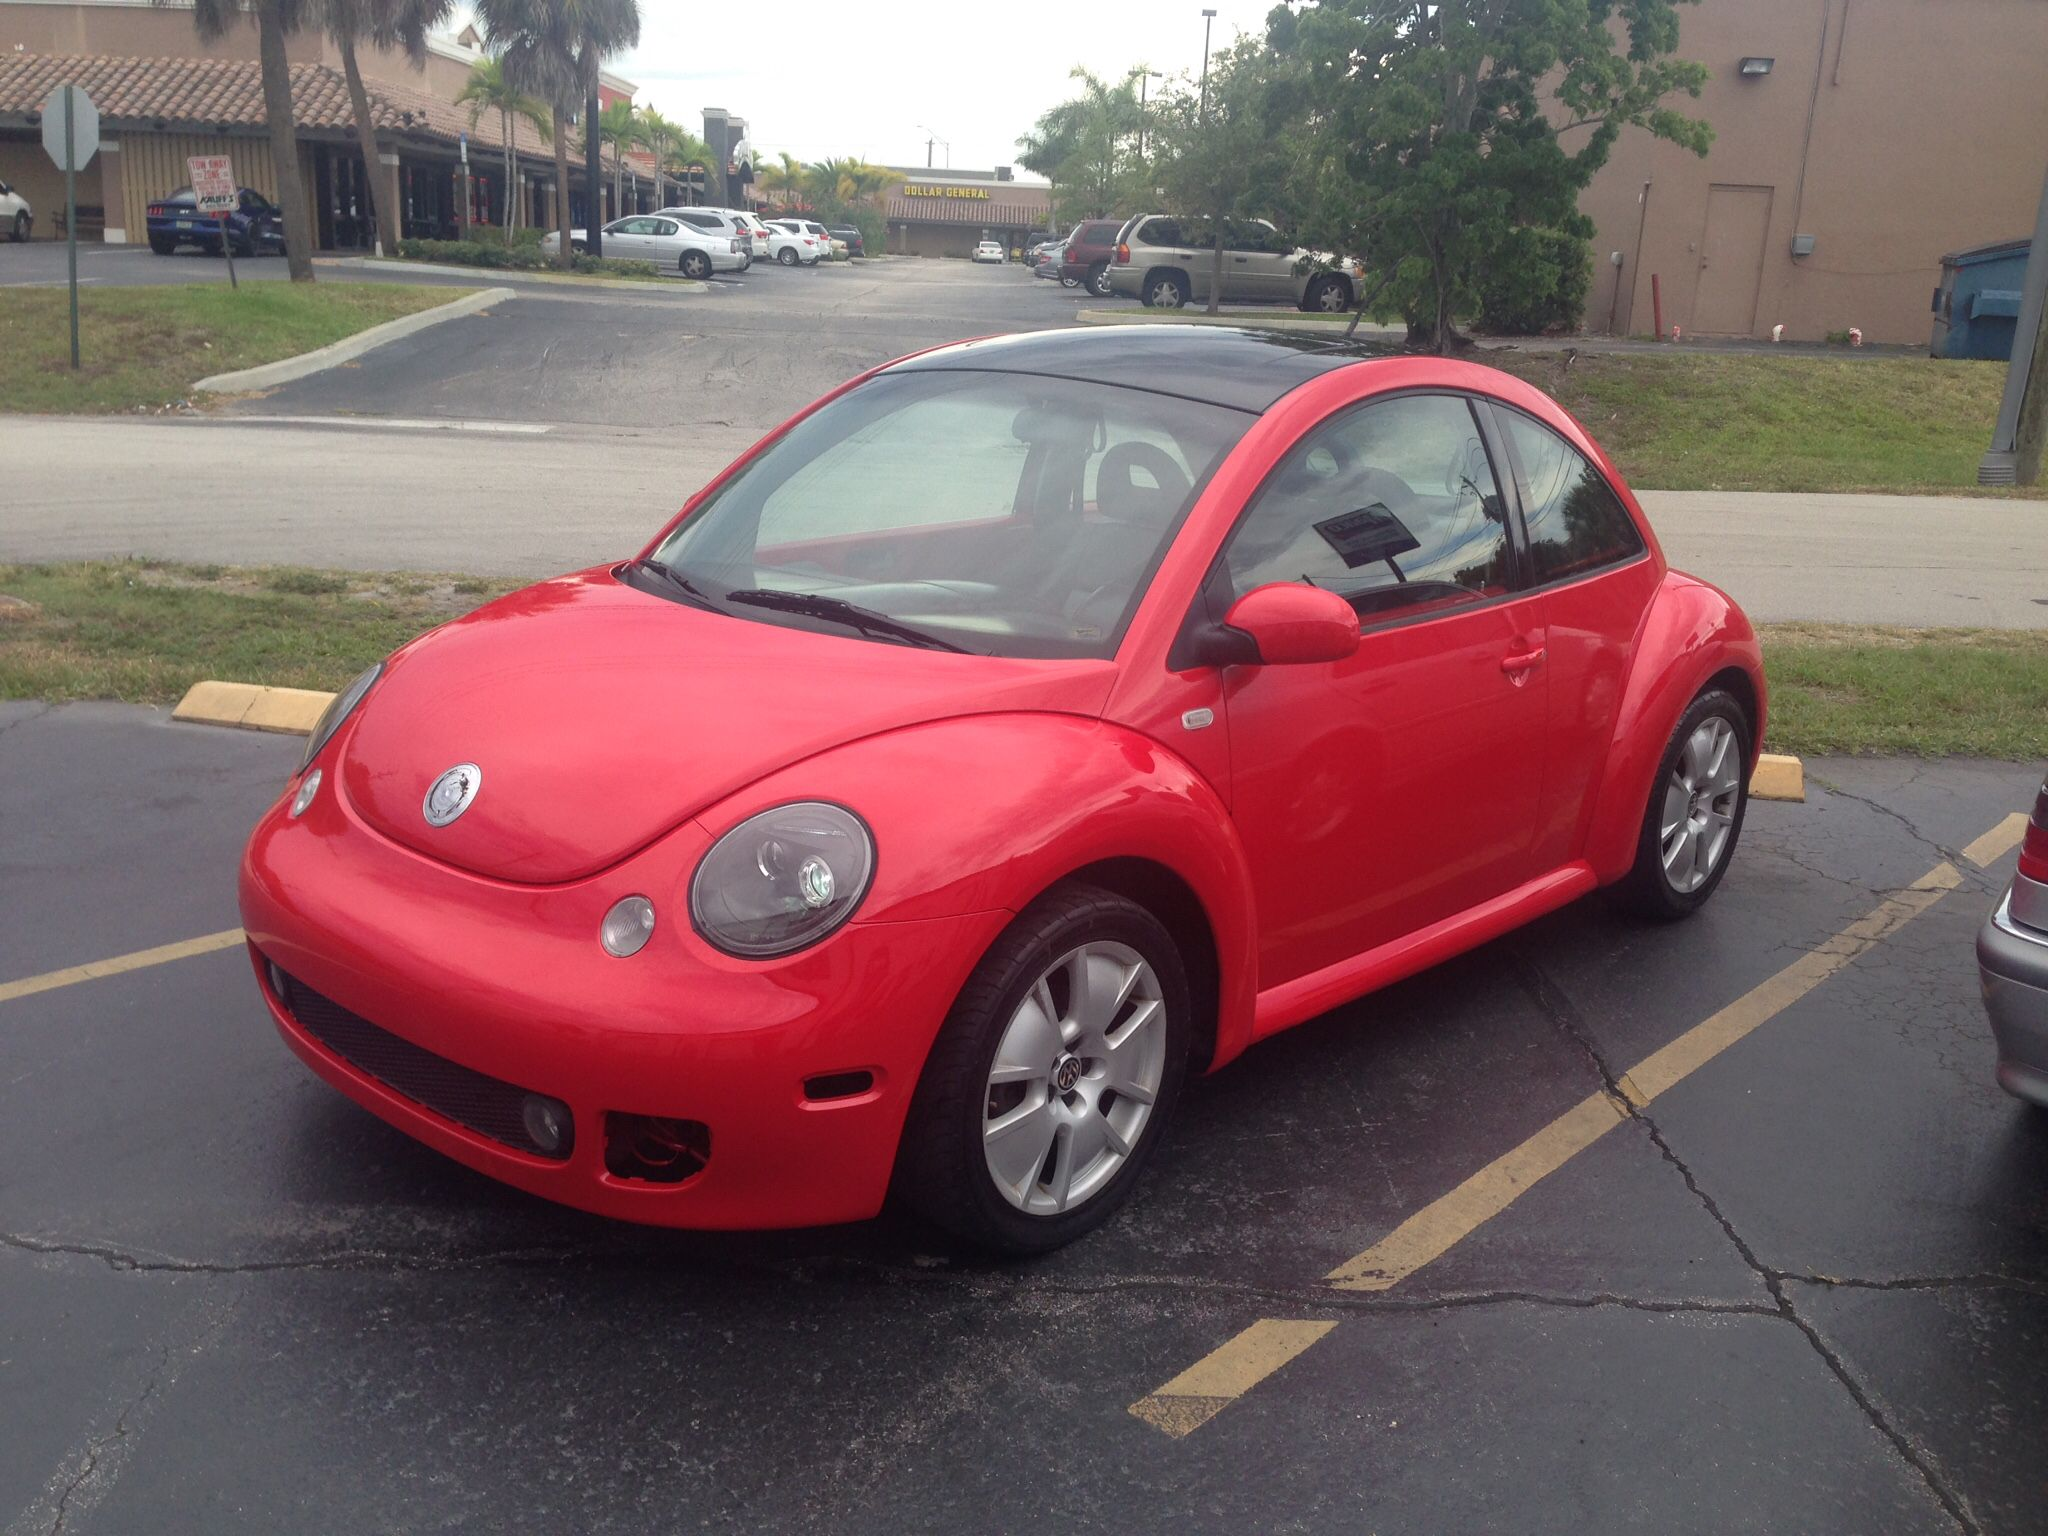 2002 beetle turbo s cars pinterest beetles volkswagen and vw. Black Bedroom Furniture Sets. Home Design Ideas